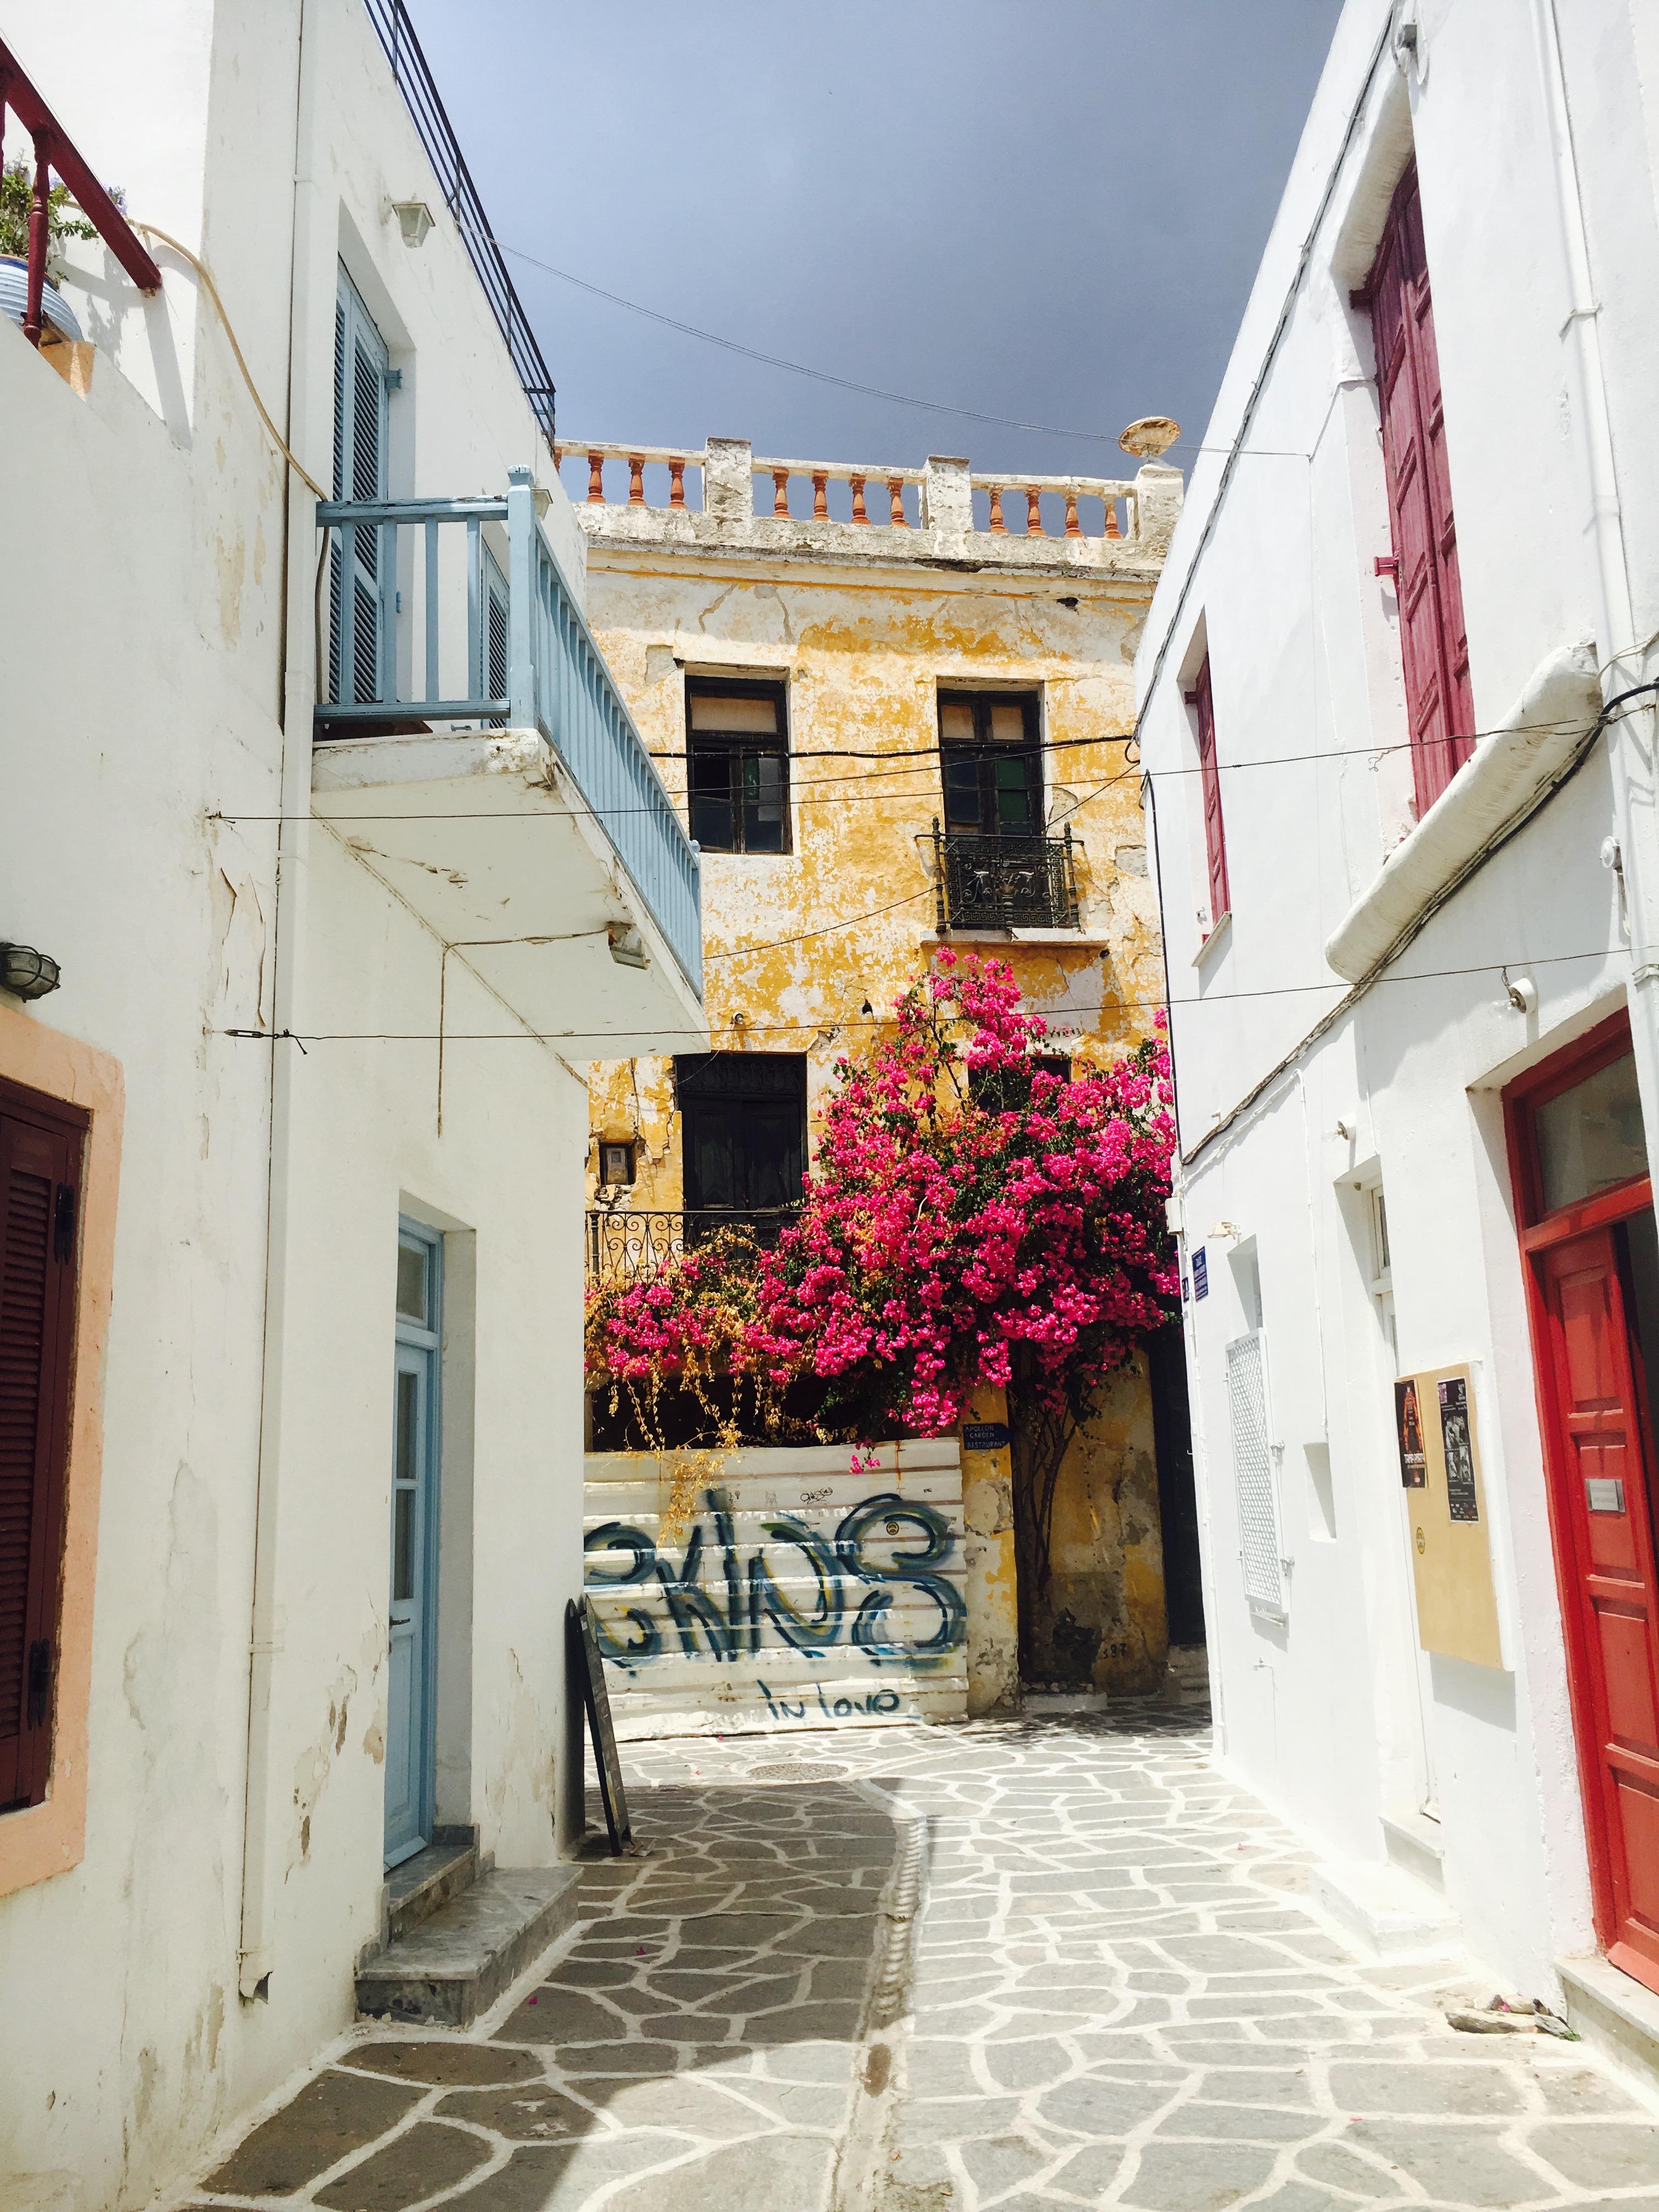 Parikia, Paros, Îles Cyclades, Grèce